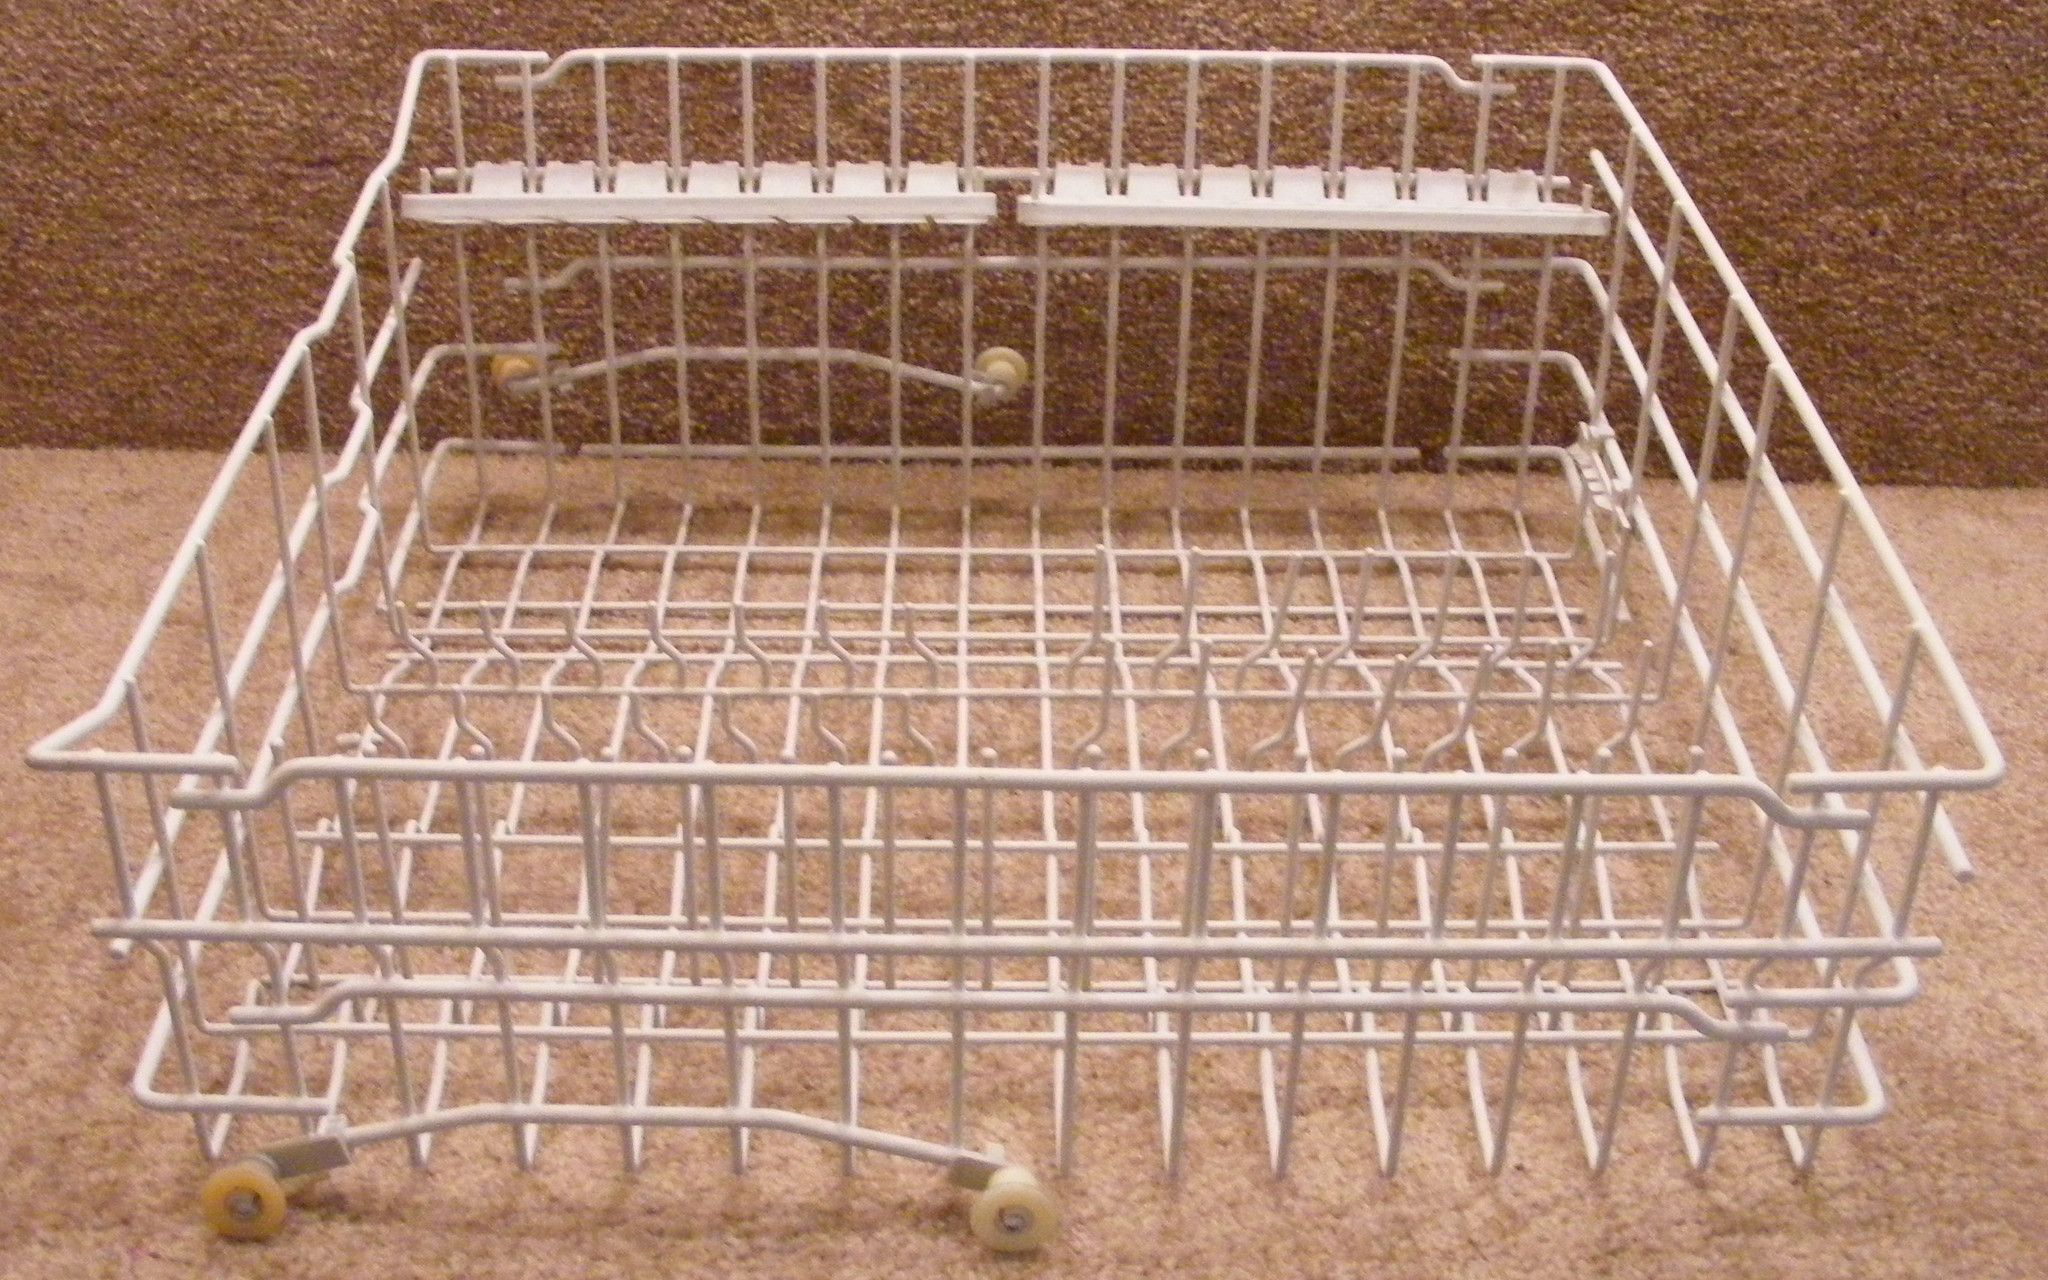 Wd28x10077 Wd28x10159 Ge Dishwasher Upper Rack Ge Dishwasher